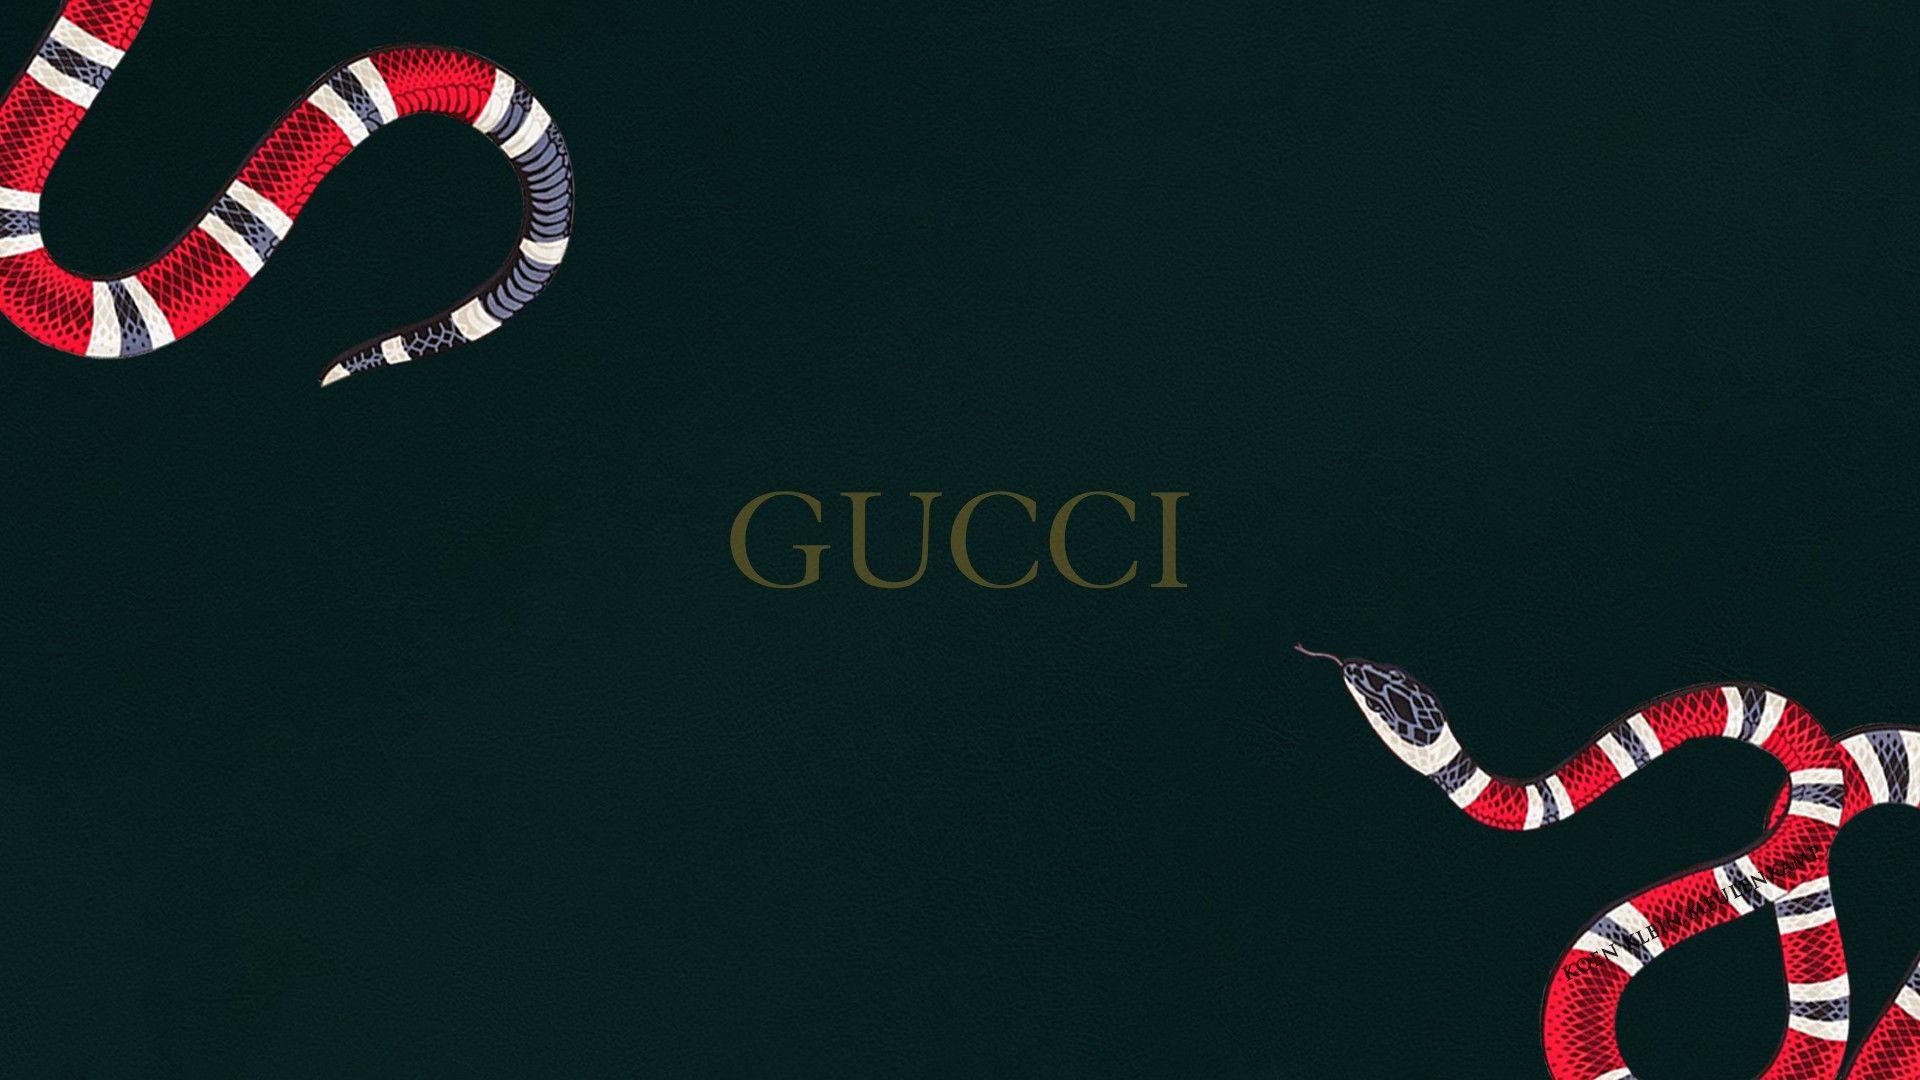 beautiful gucci wallpaper 1920x1080 hd 1080p | Gucci in 2019 | Pinterest | Gucci wallpaper ...